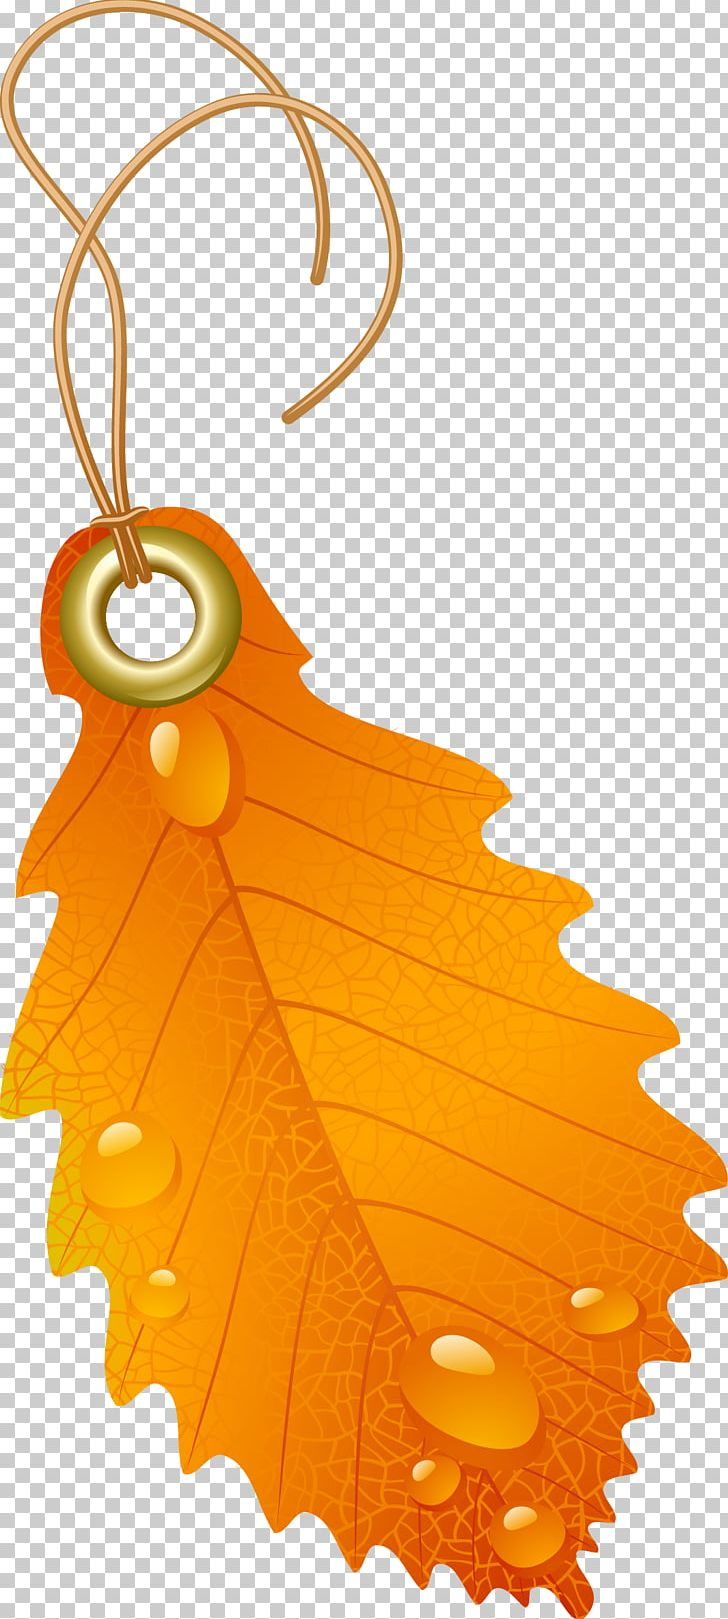 Japanese Maple Autumn Leaf Color Maple Leaf Red Maple PNG, Clipart, Autumn, Autumn Leaf Color, Boxelder Maple, Color, Fruit Free PNG Download